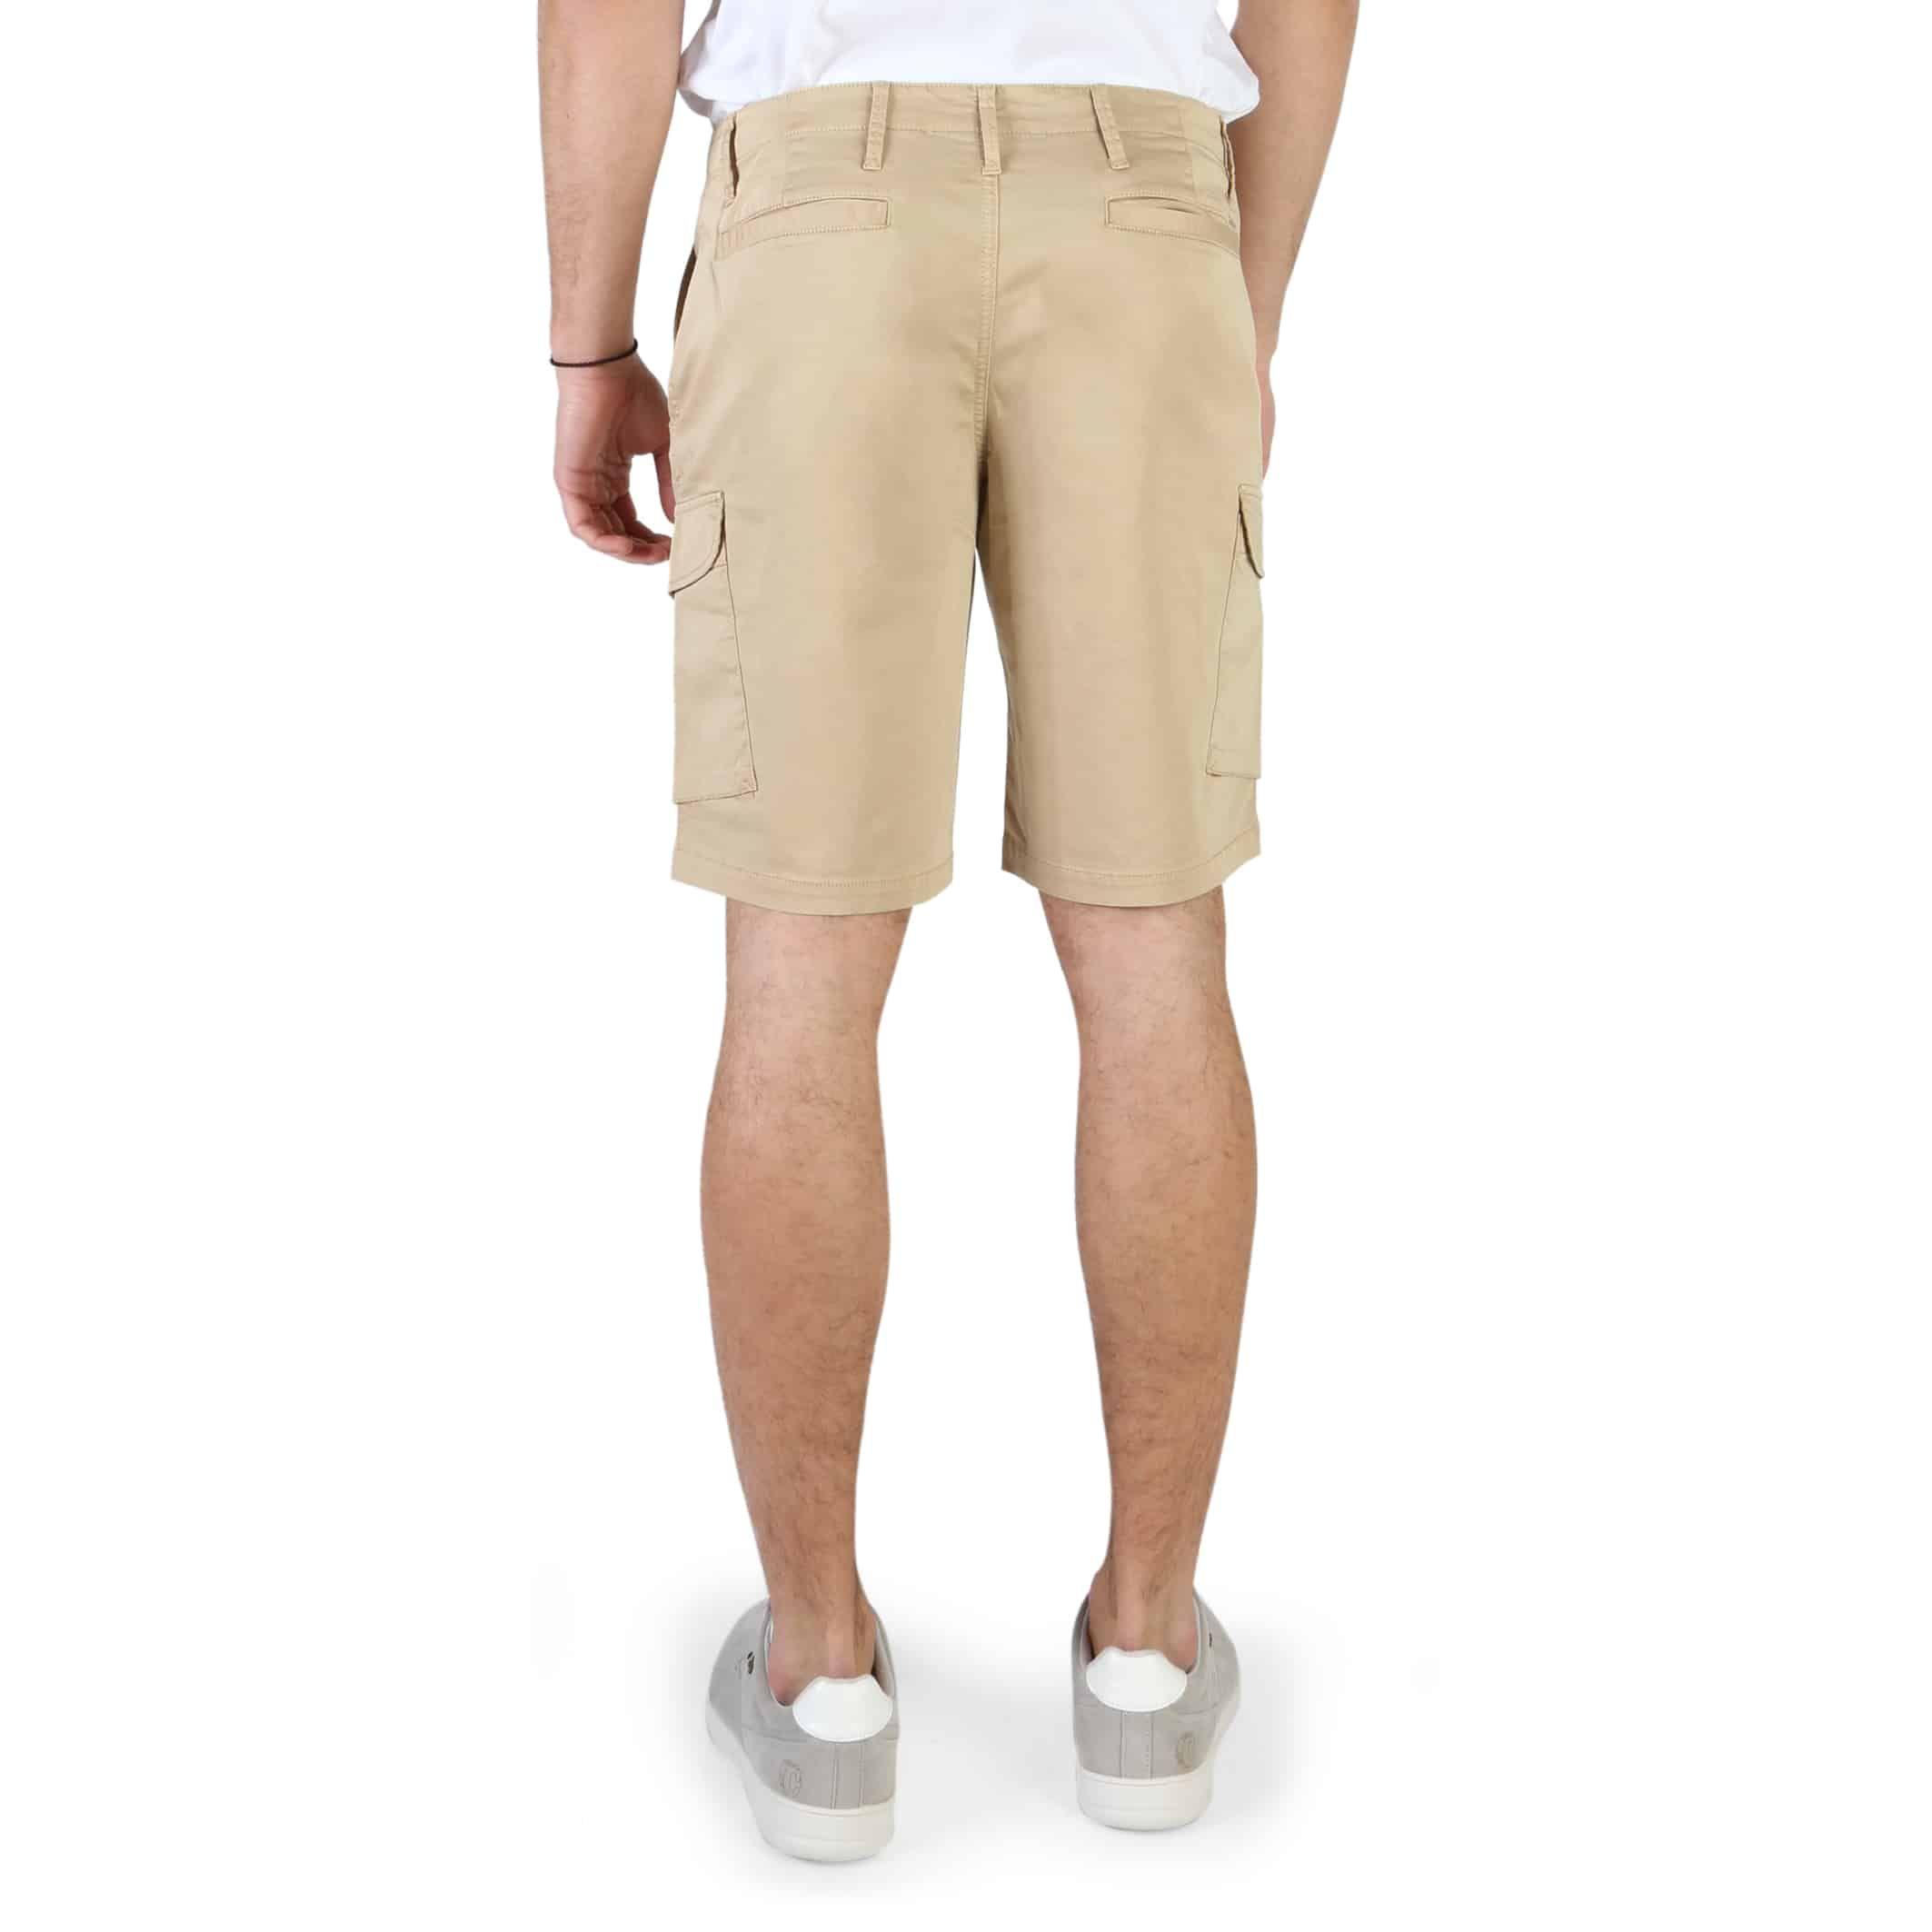 Armani Jeans – 3Y6S33_6NEDZ – Marrone